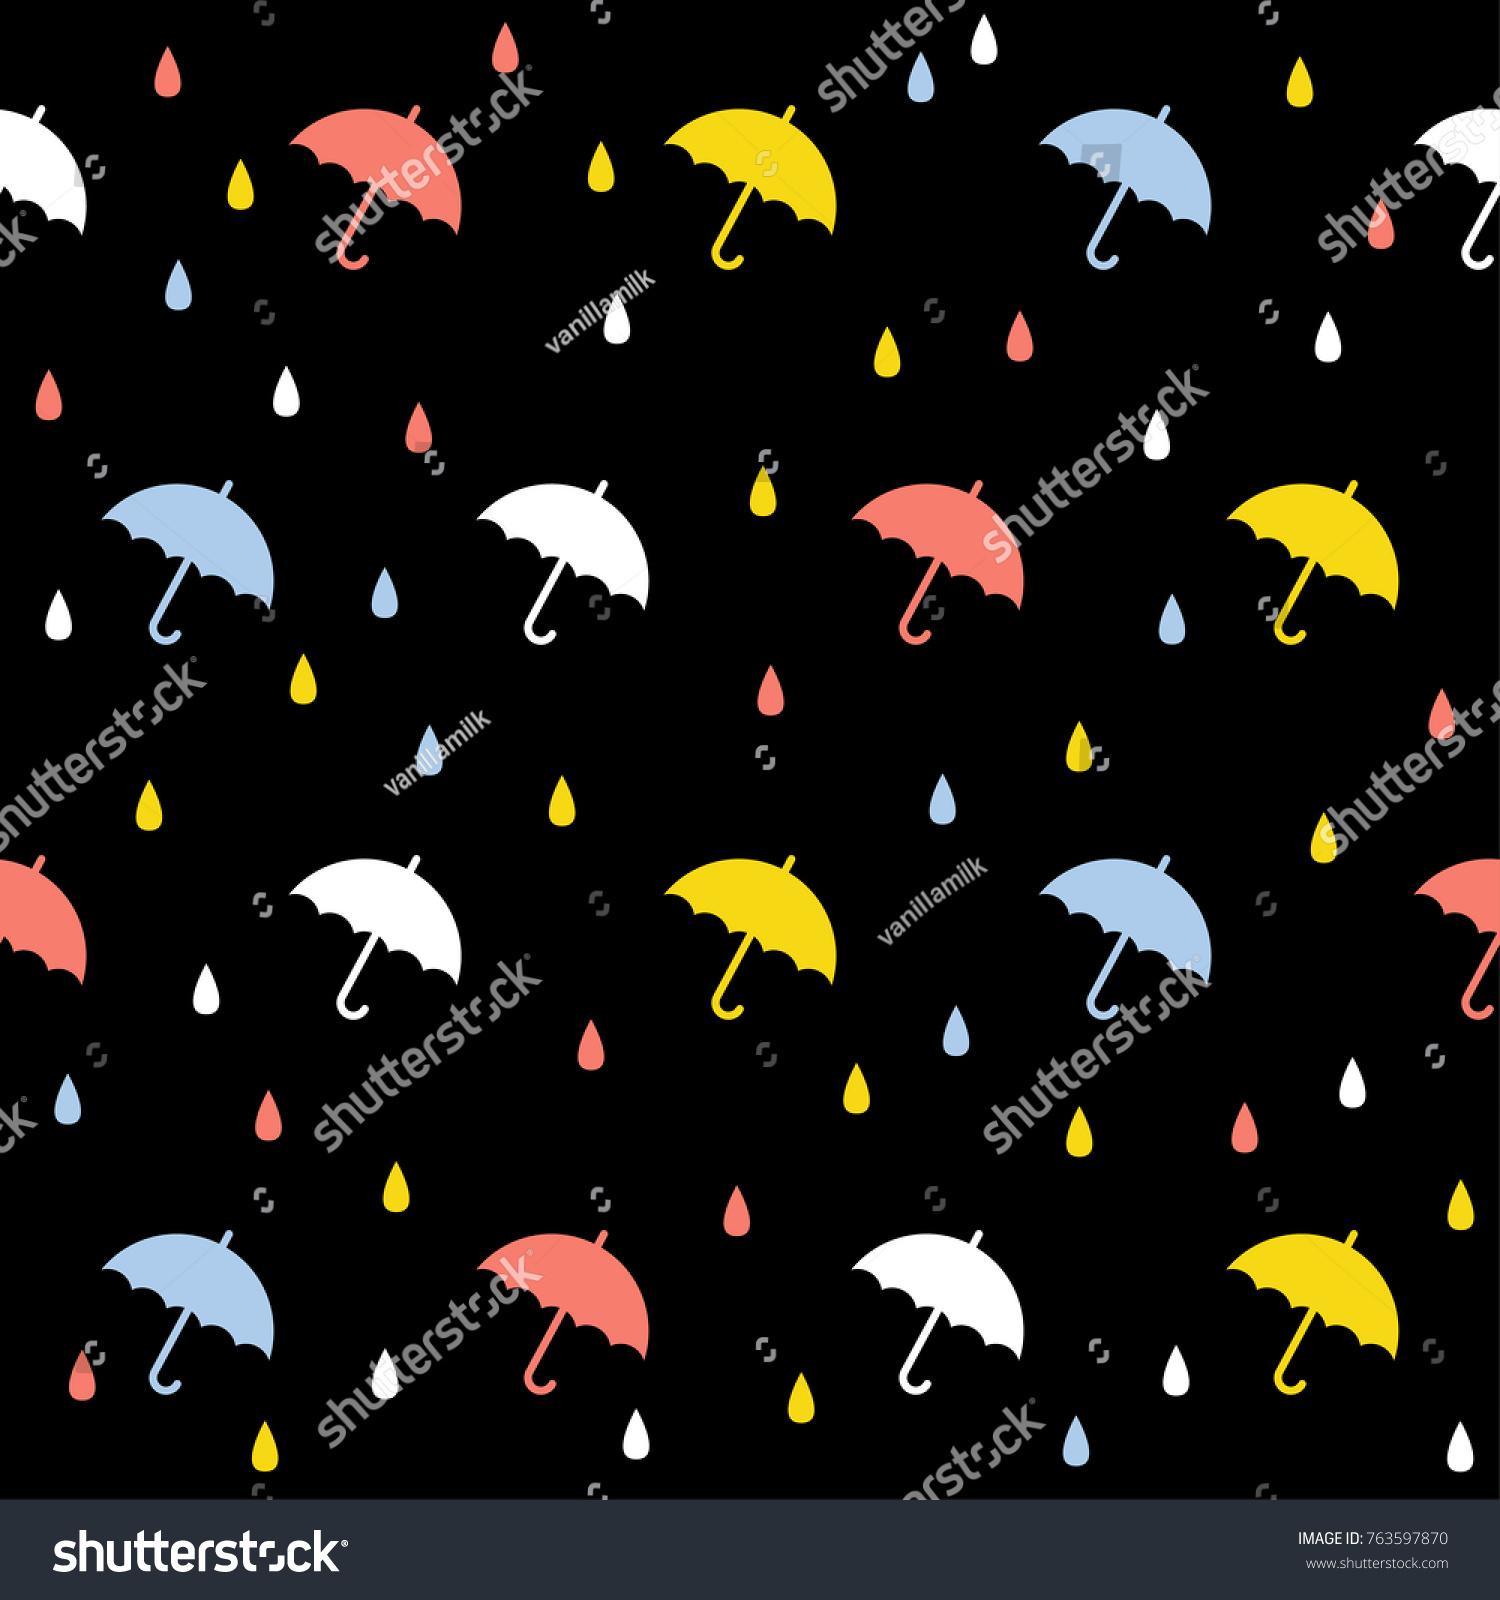 Abstract Handmade Umbrella Drop Seamless Pattern 763597870